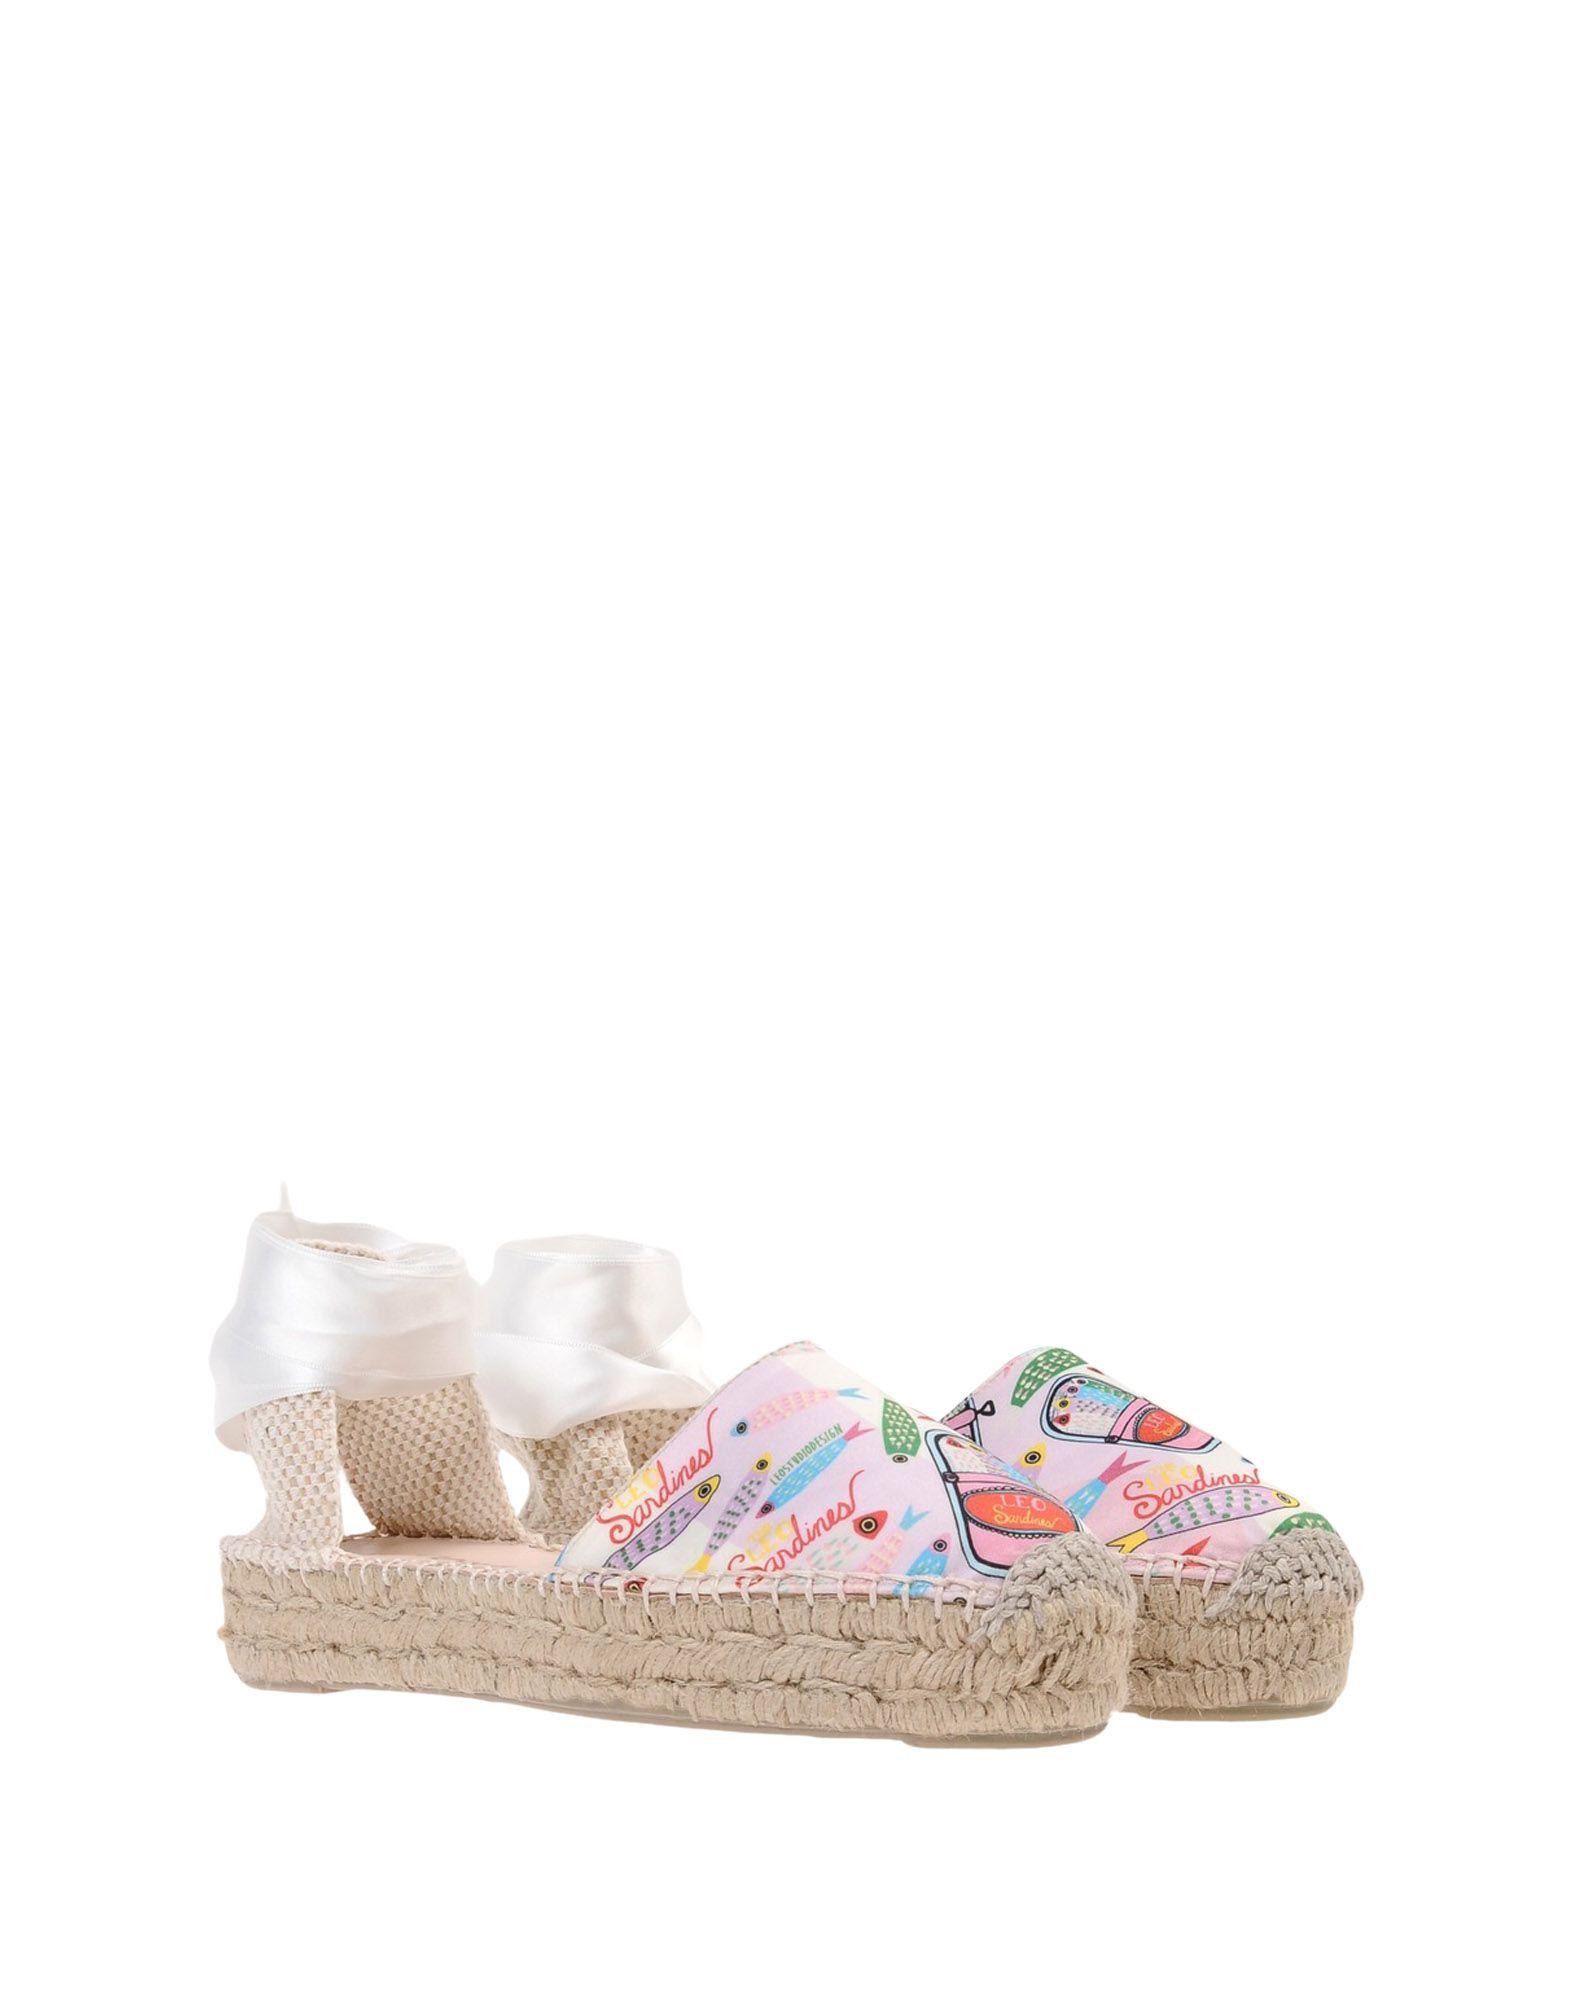 Leo Studio Design Lace Up Satin Espadrilles   Espadrilles 11457407BU Gute Qualität beliebte Schuhe 655713